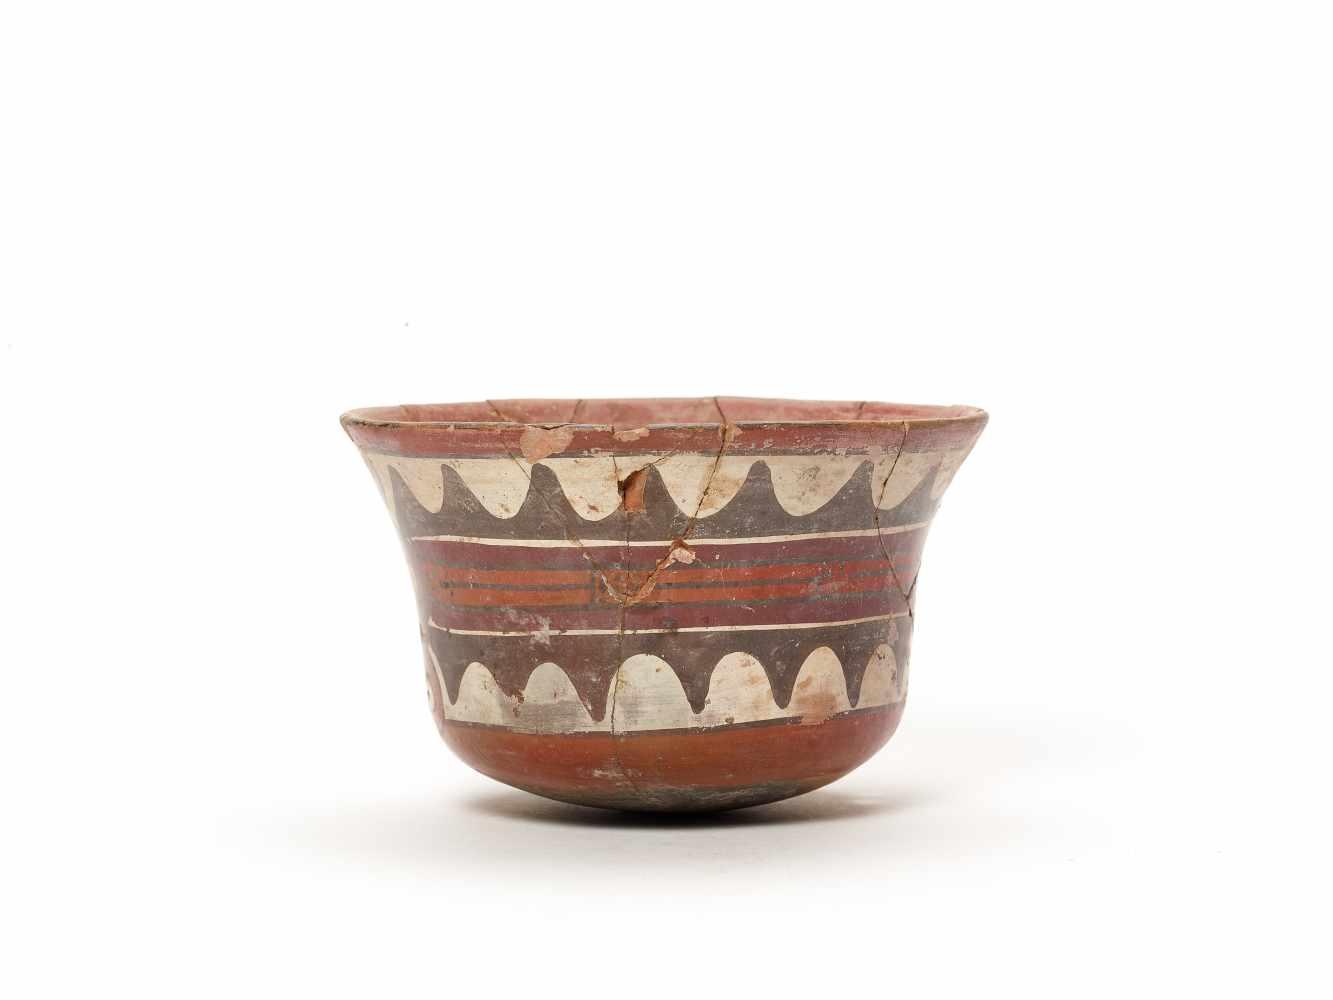 BOWL WITH GOD REPRESENTATION - NAZCA, PERU, C. 300-600 ADPainted clayNazca, Peru, c. 300-600 - Image 2 of 3